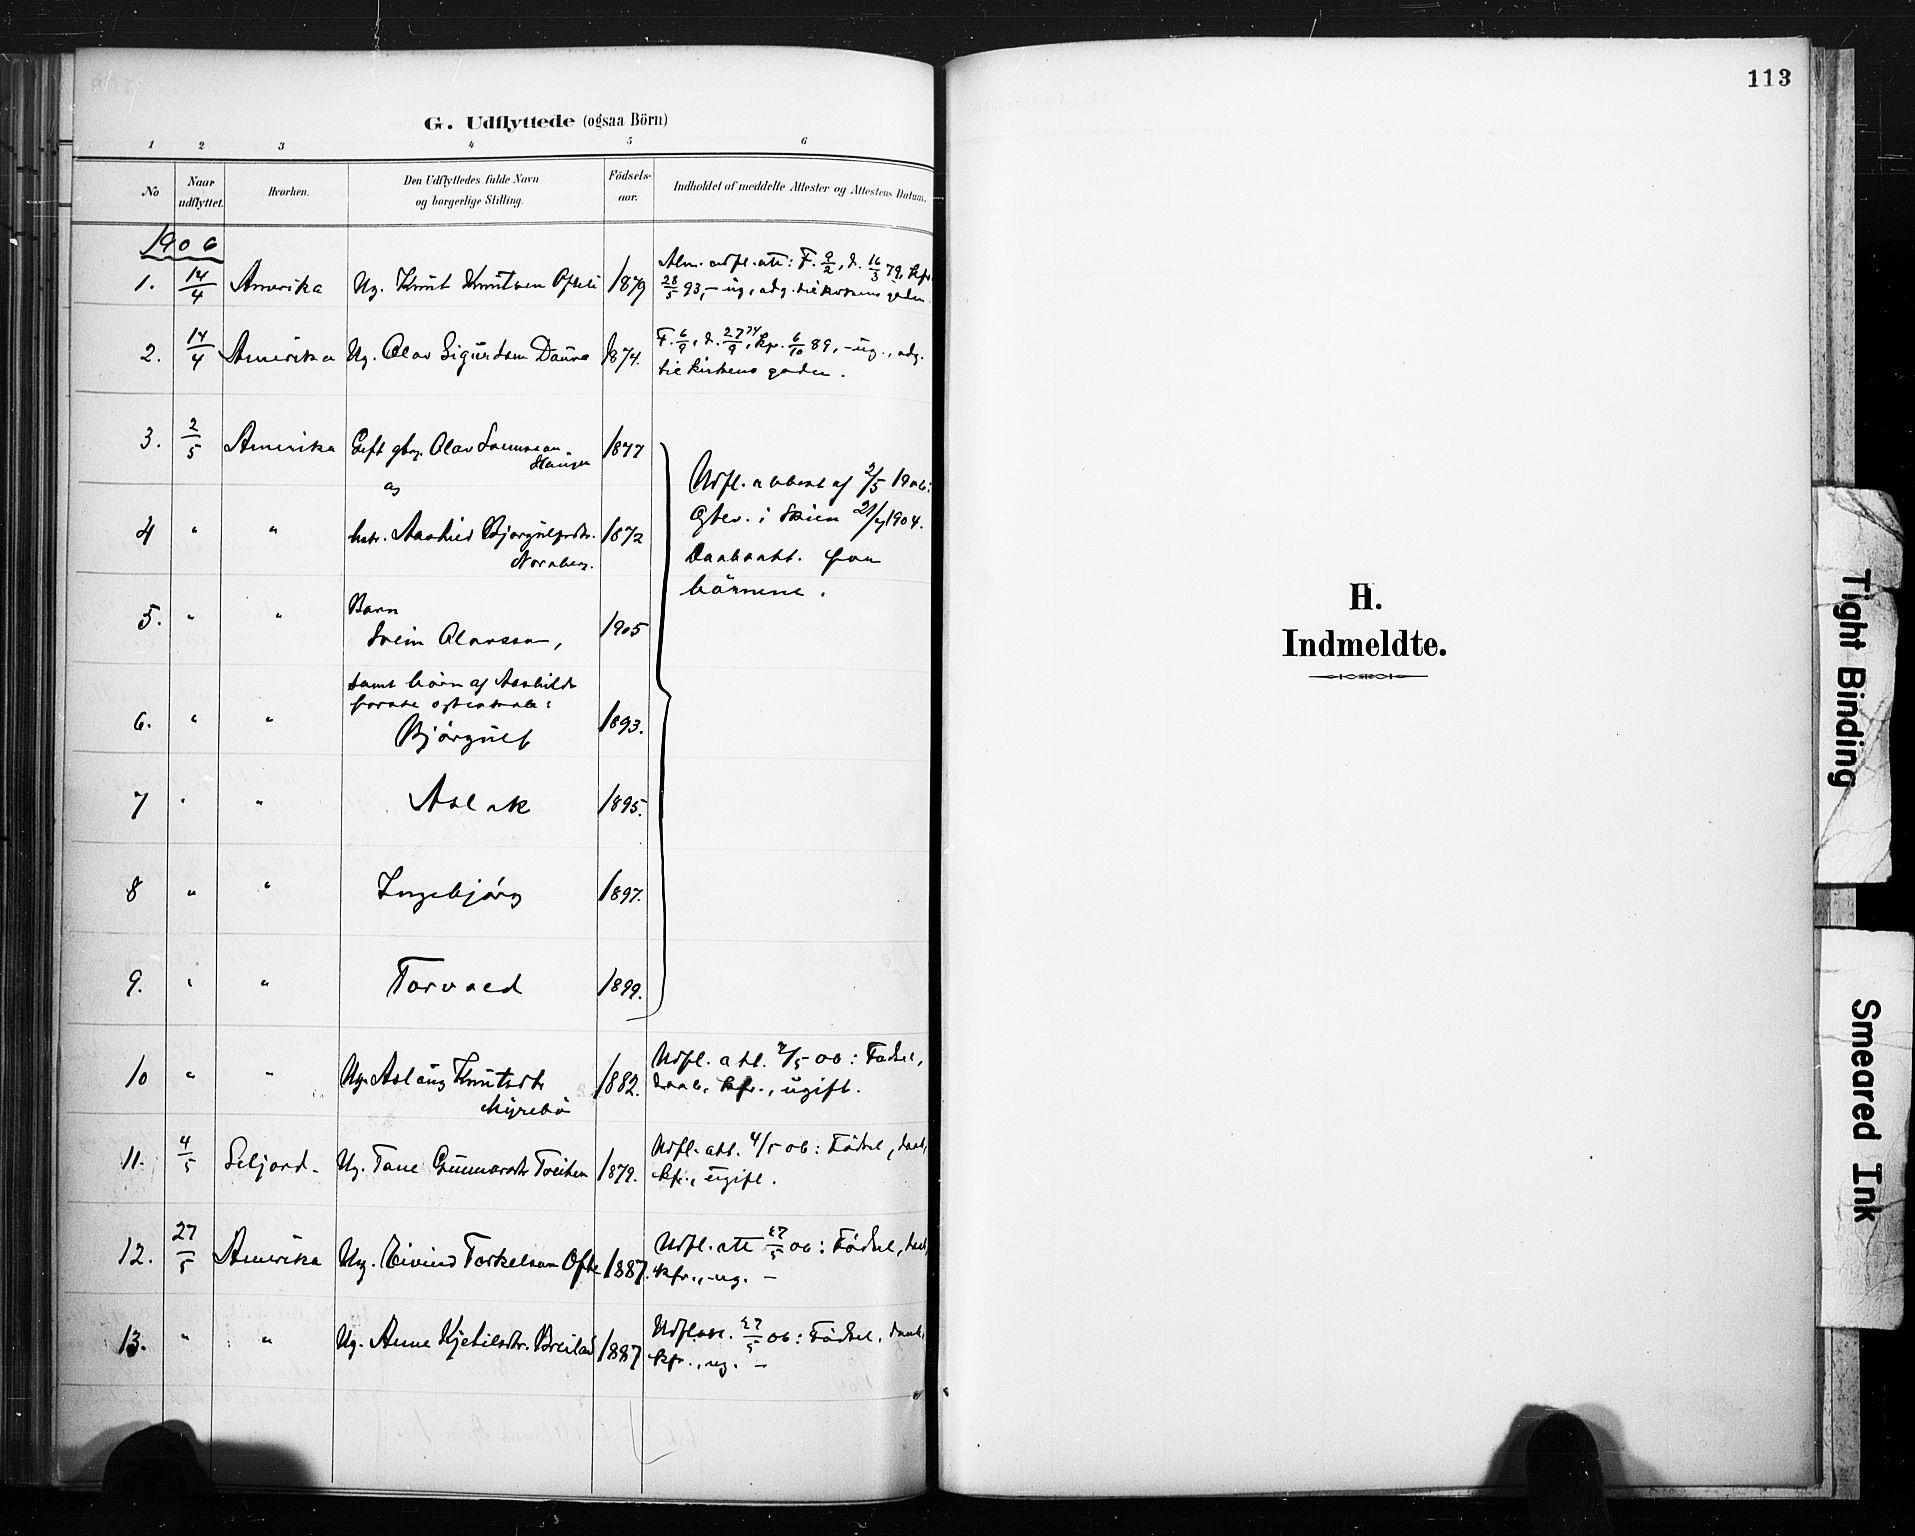 SAKO, Lårdal kirkebøker, F/Fc/L0002: Ministerialbok nr. III 2, 1887-1906, s. 113